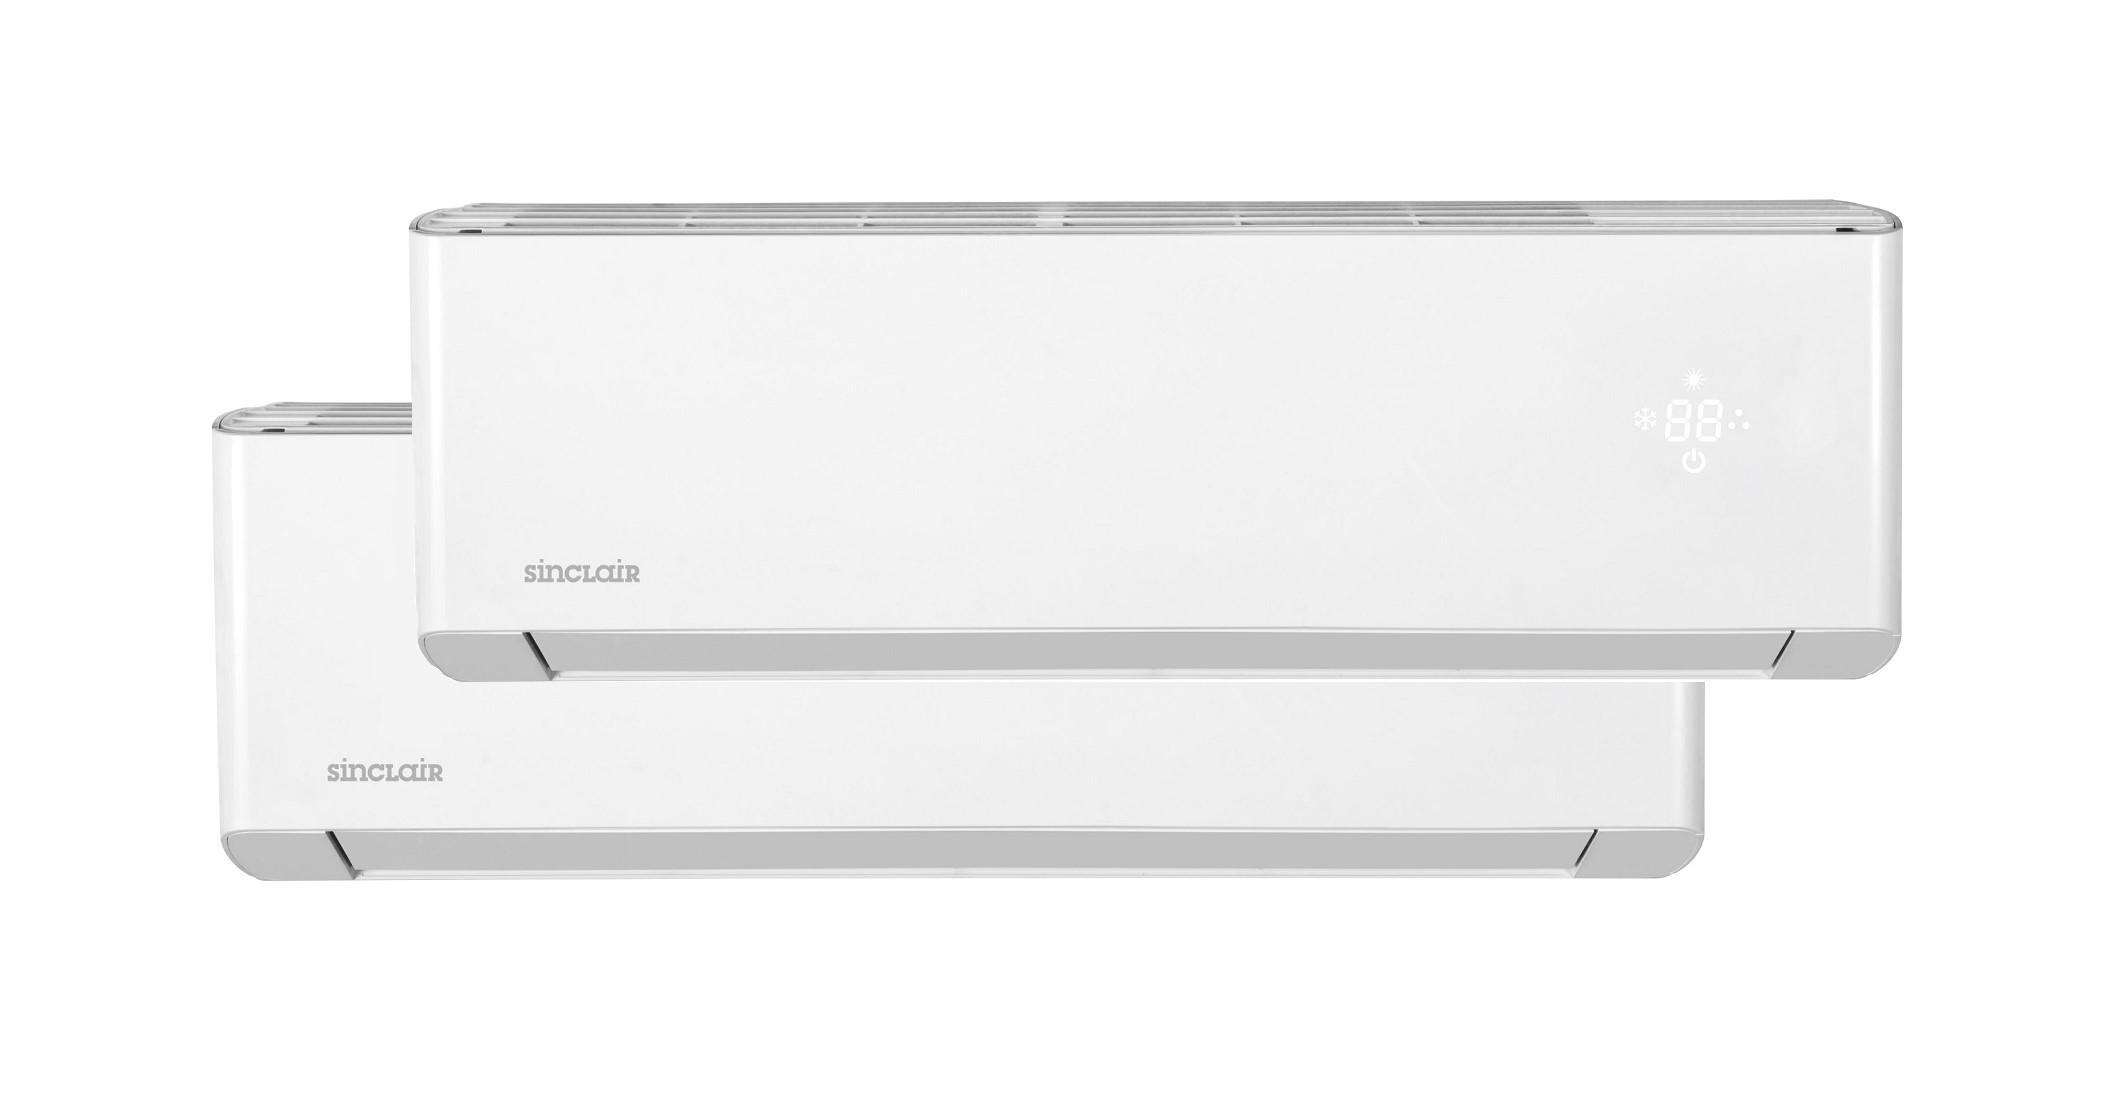 Sinclair Multi variable 21